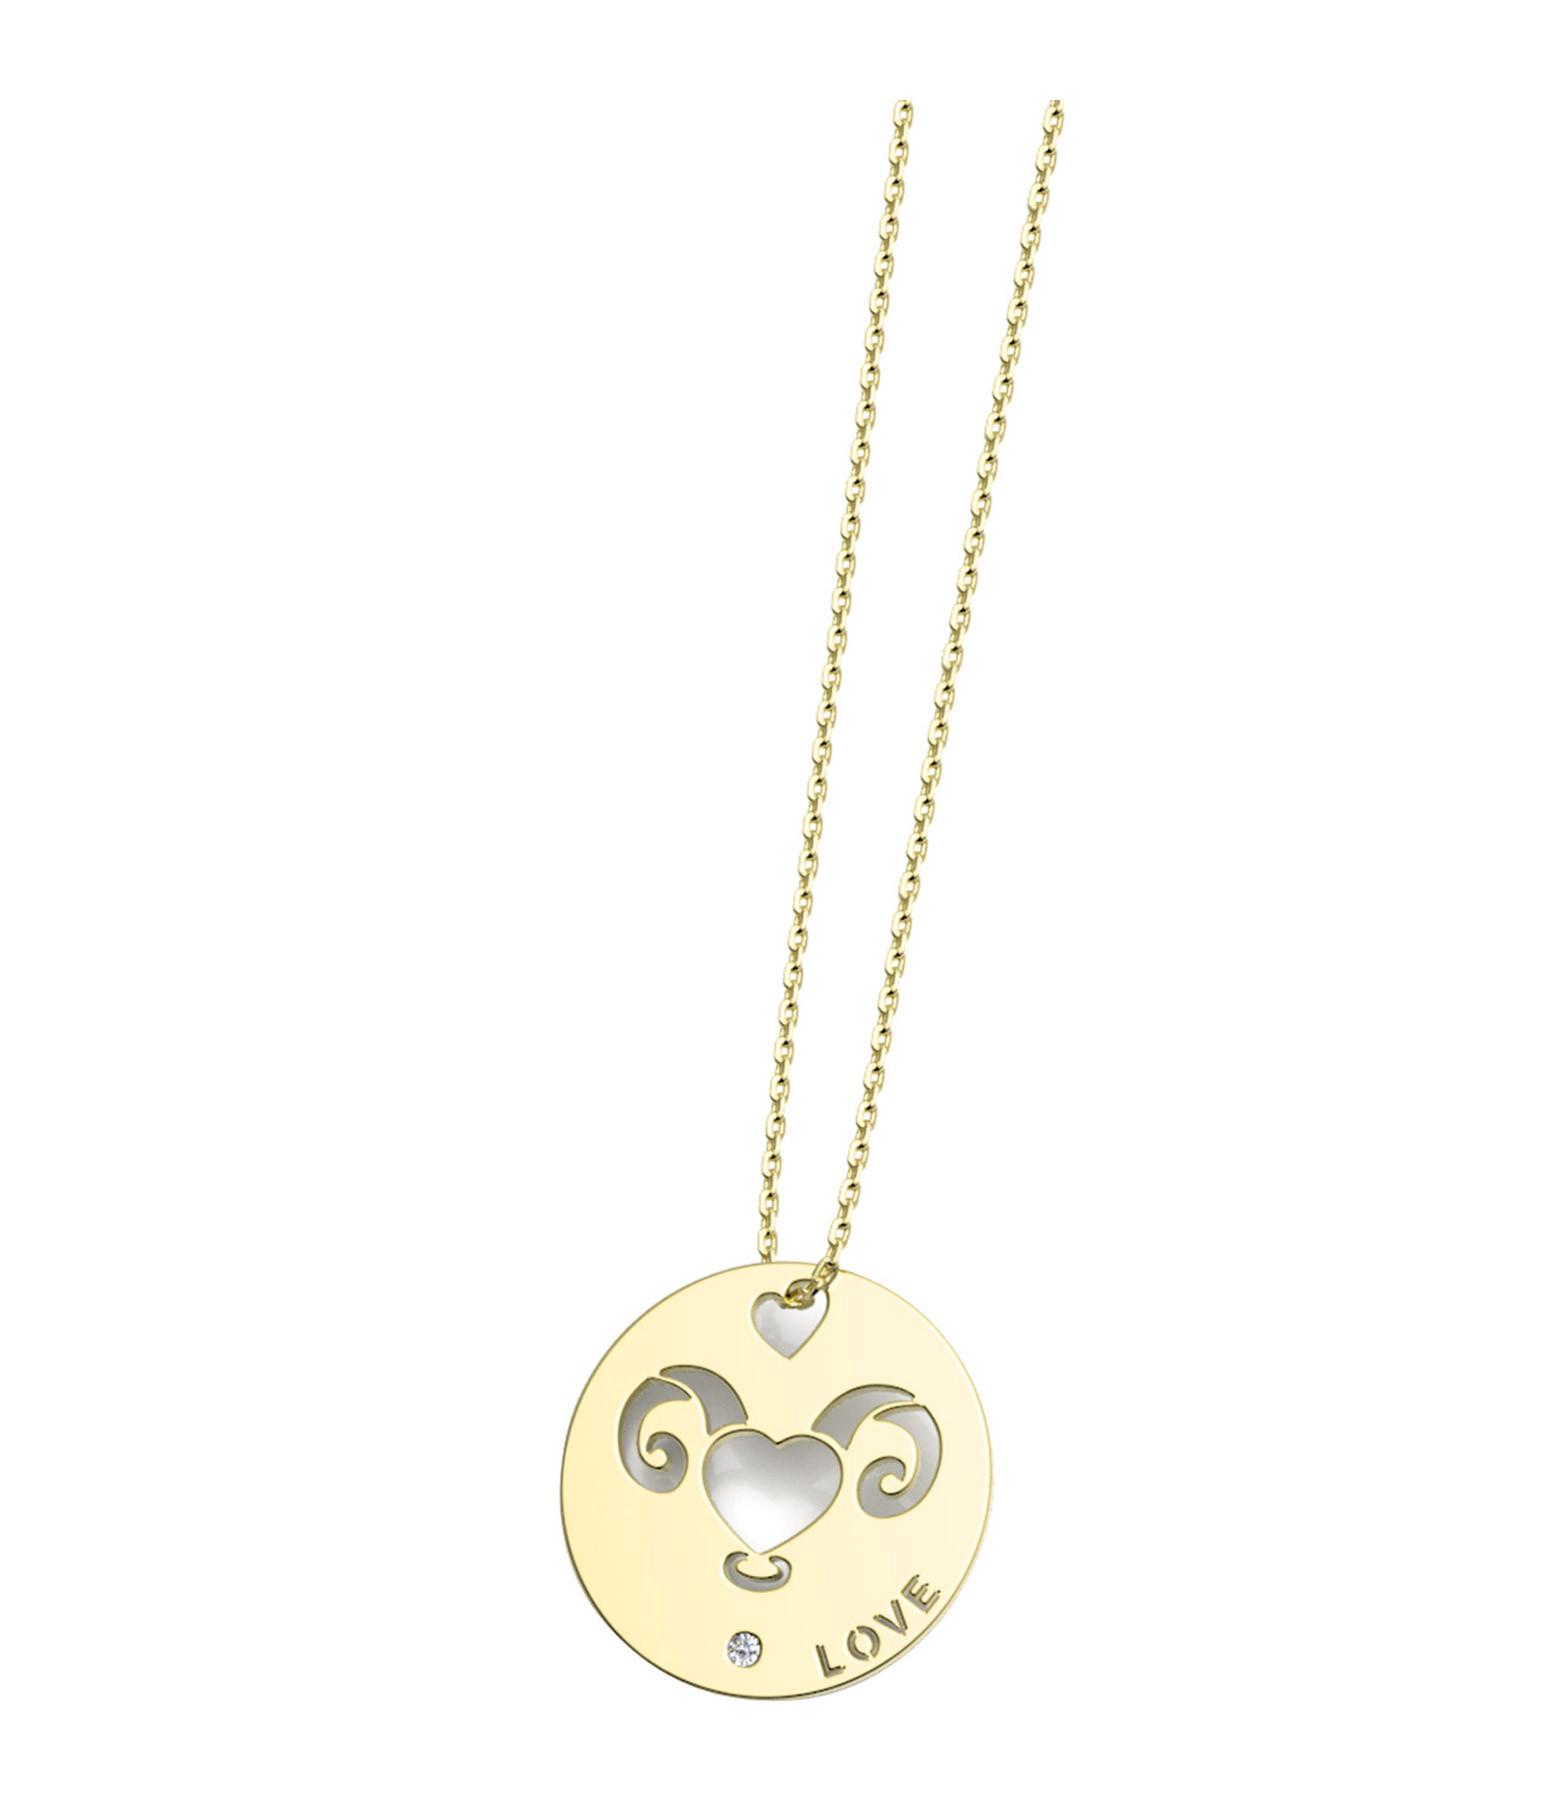 NAVA JOAILLERIE - Collier Horosco-Rock Bélier Diamants Or